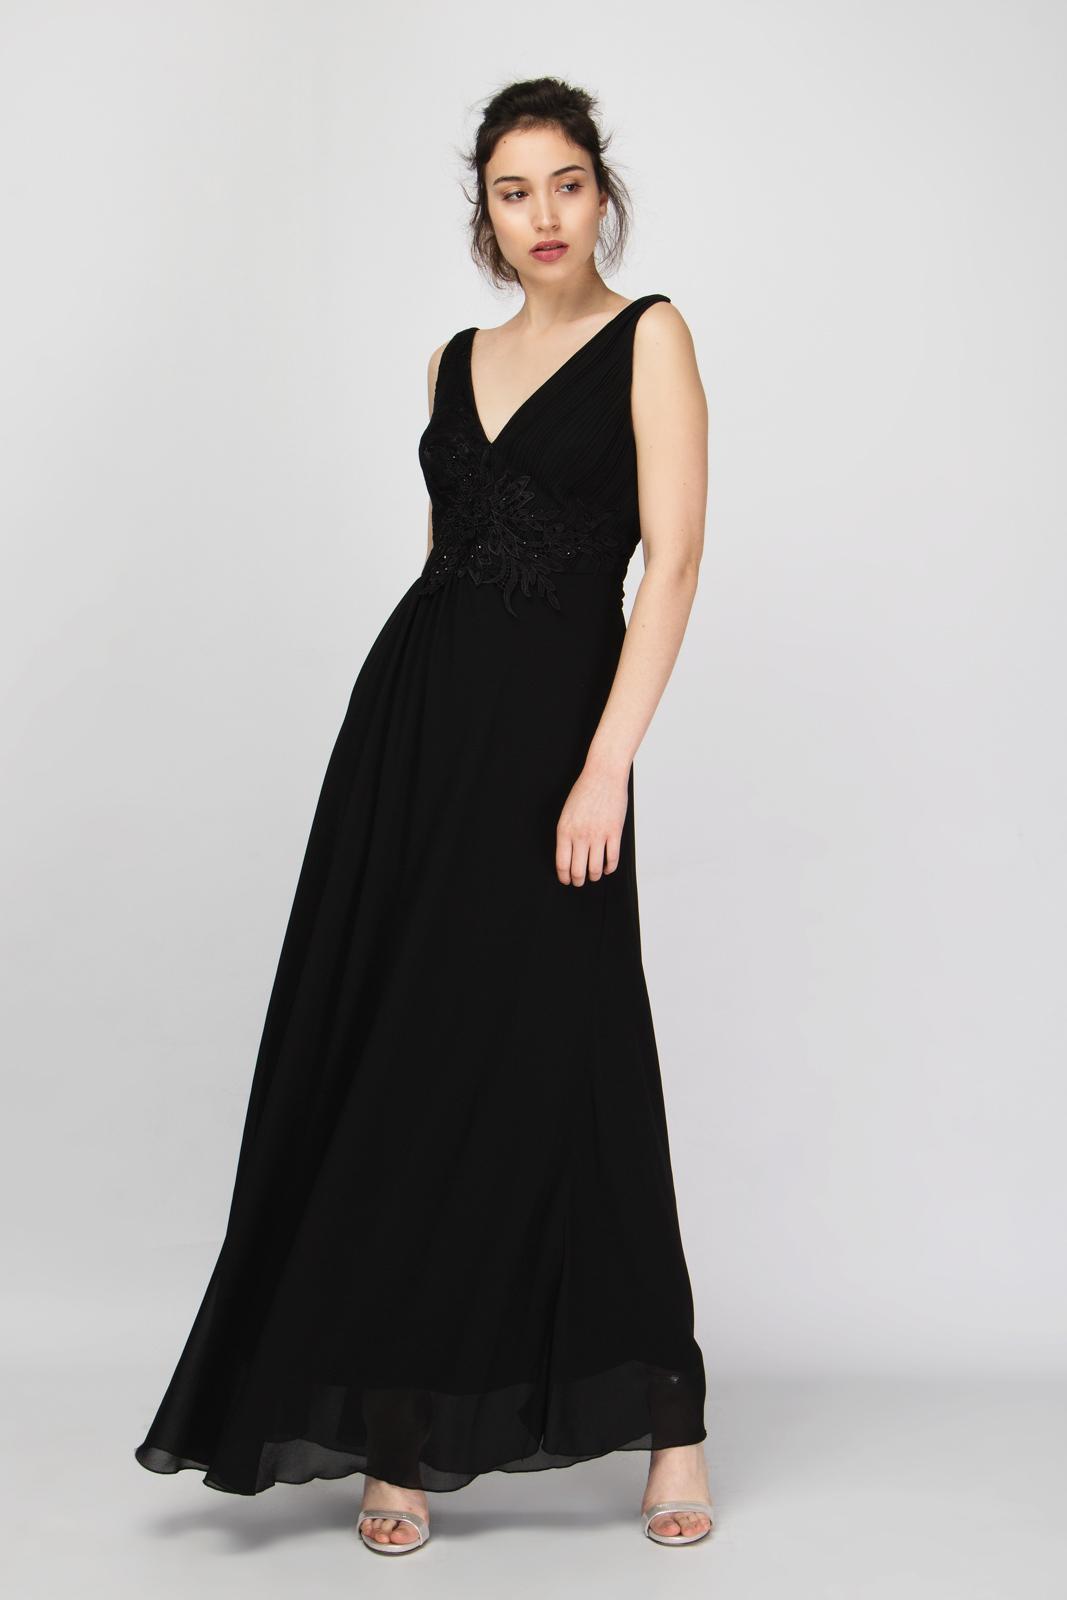 4b87fba6eb46 Μάξι Φόρεμα Chiffon V Μπούστο με Μοτίφ Strass